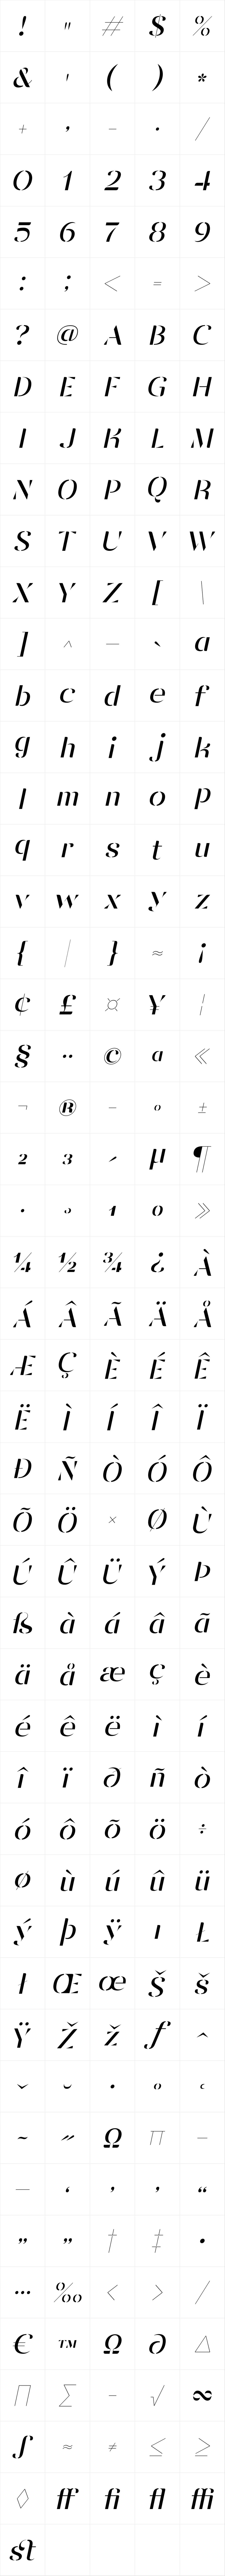 Vanage Light Italic